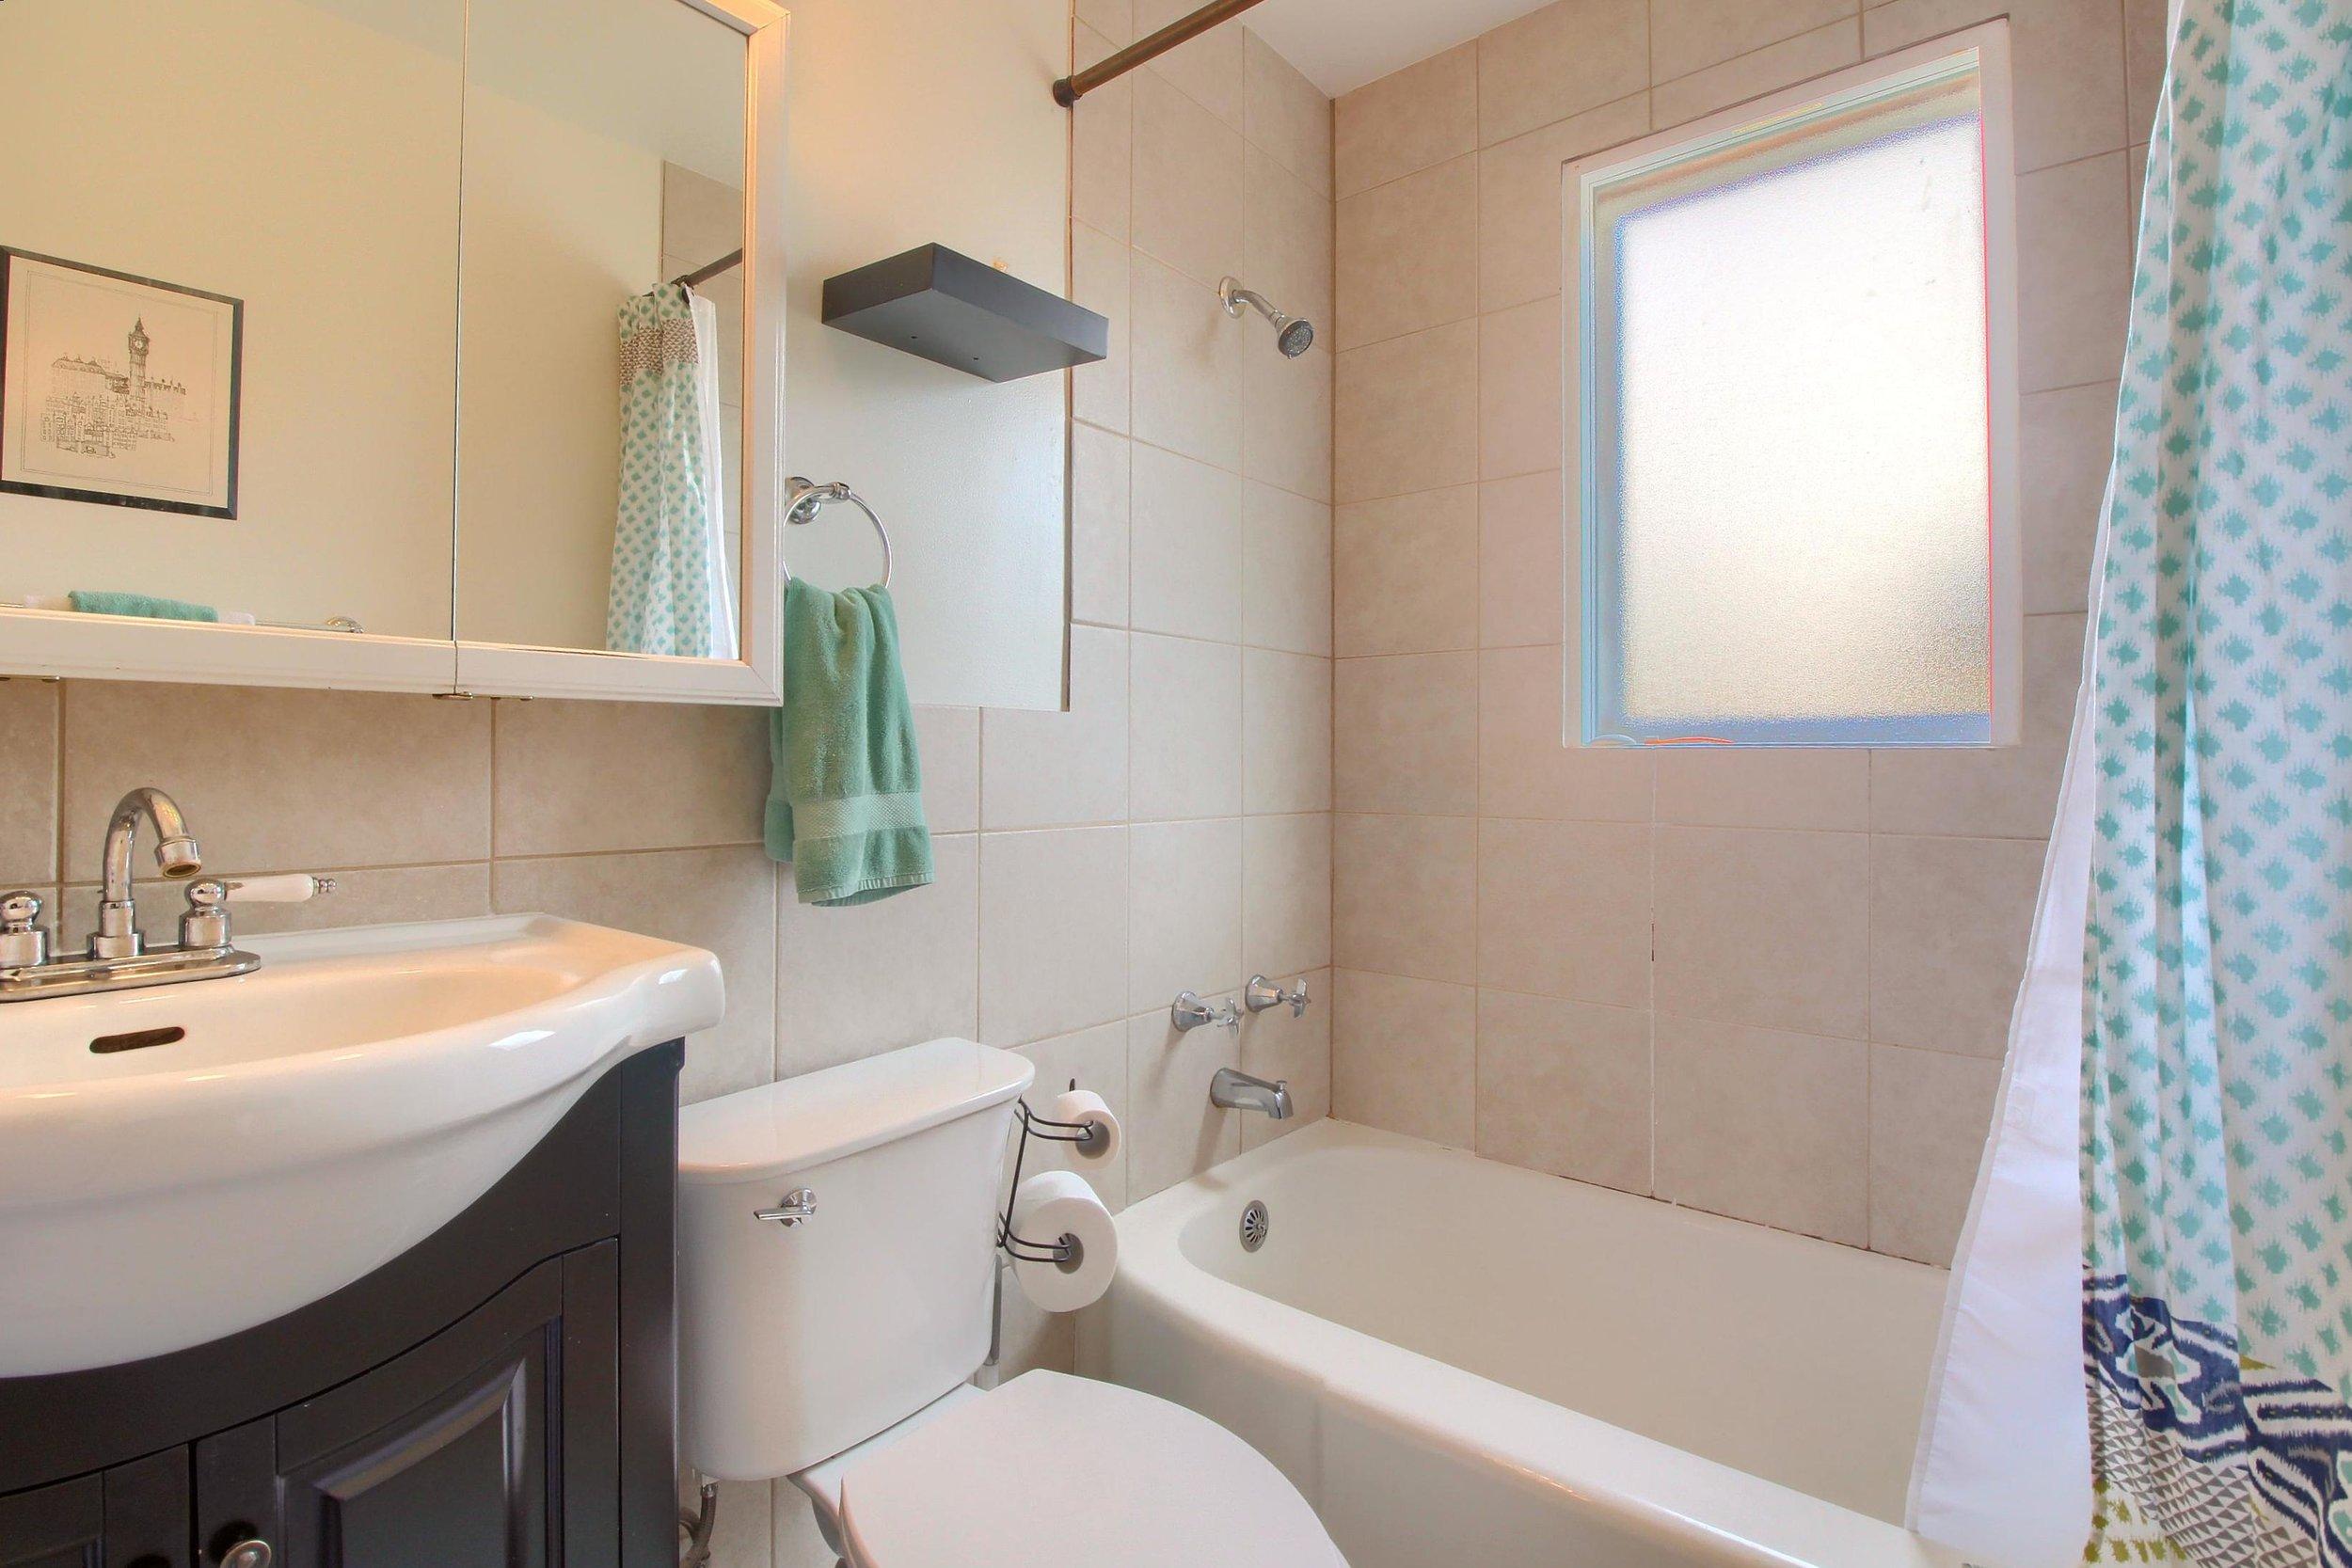 05_Master_Bathroom_IMG_1226.JPG